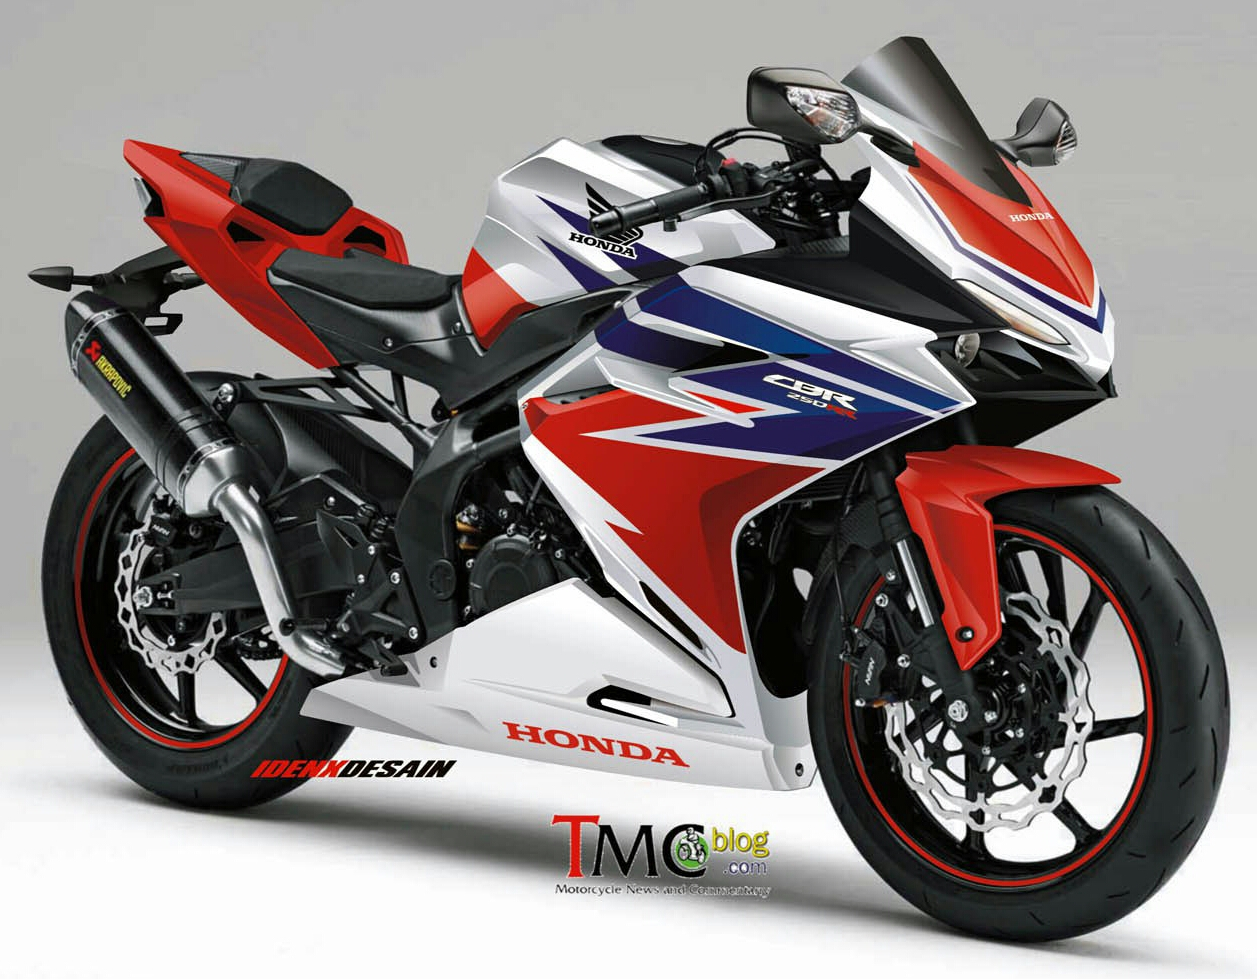 Concept 2017 Honda CBR250RR SportBike Motorcycle | CBR350RR CBR300RR